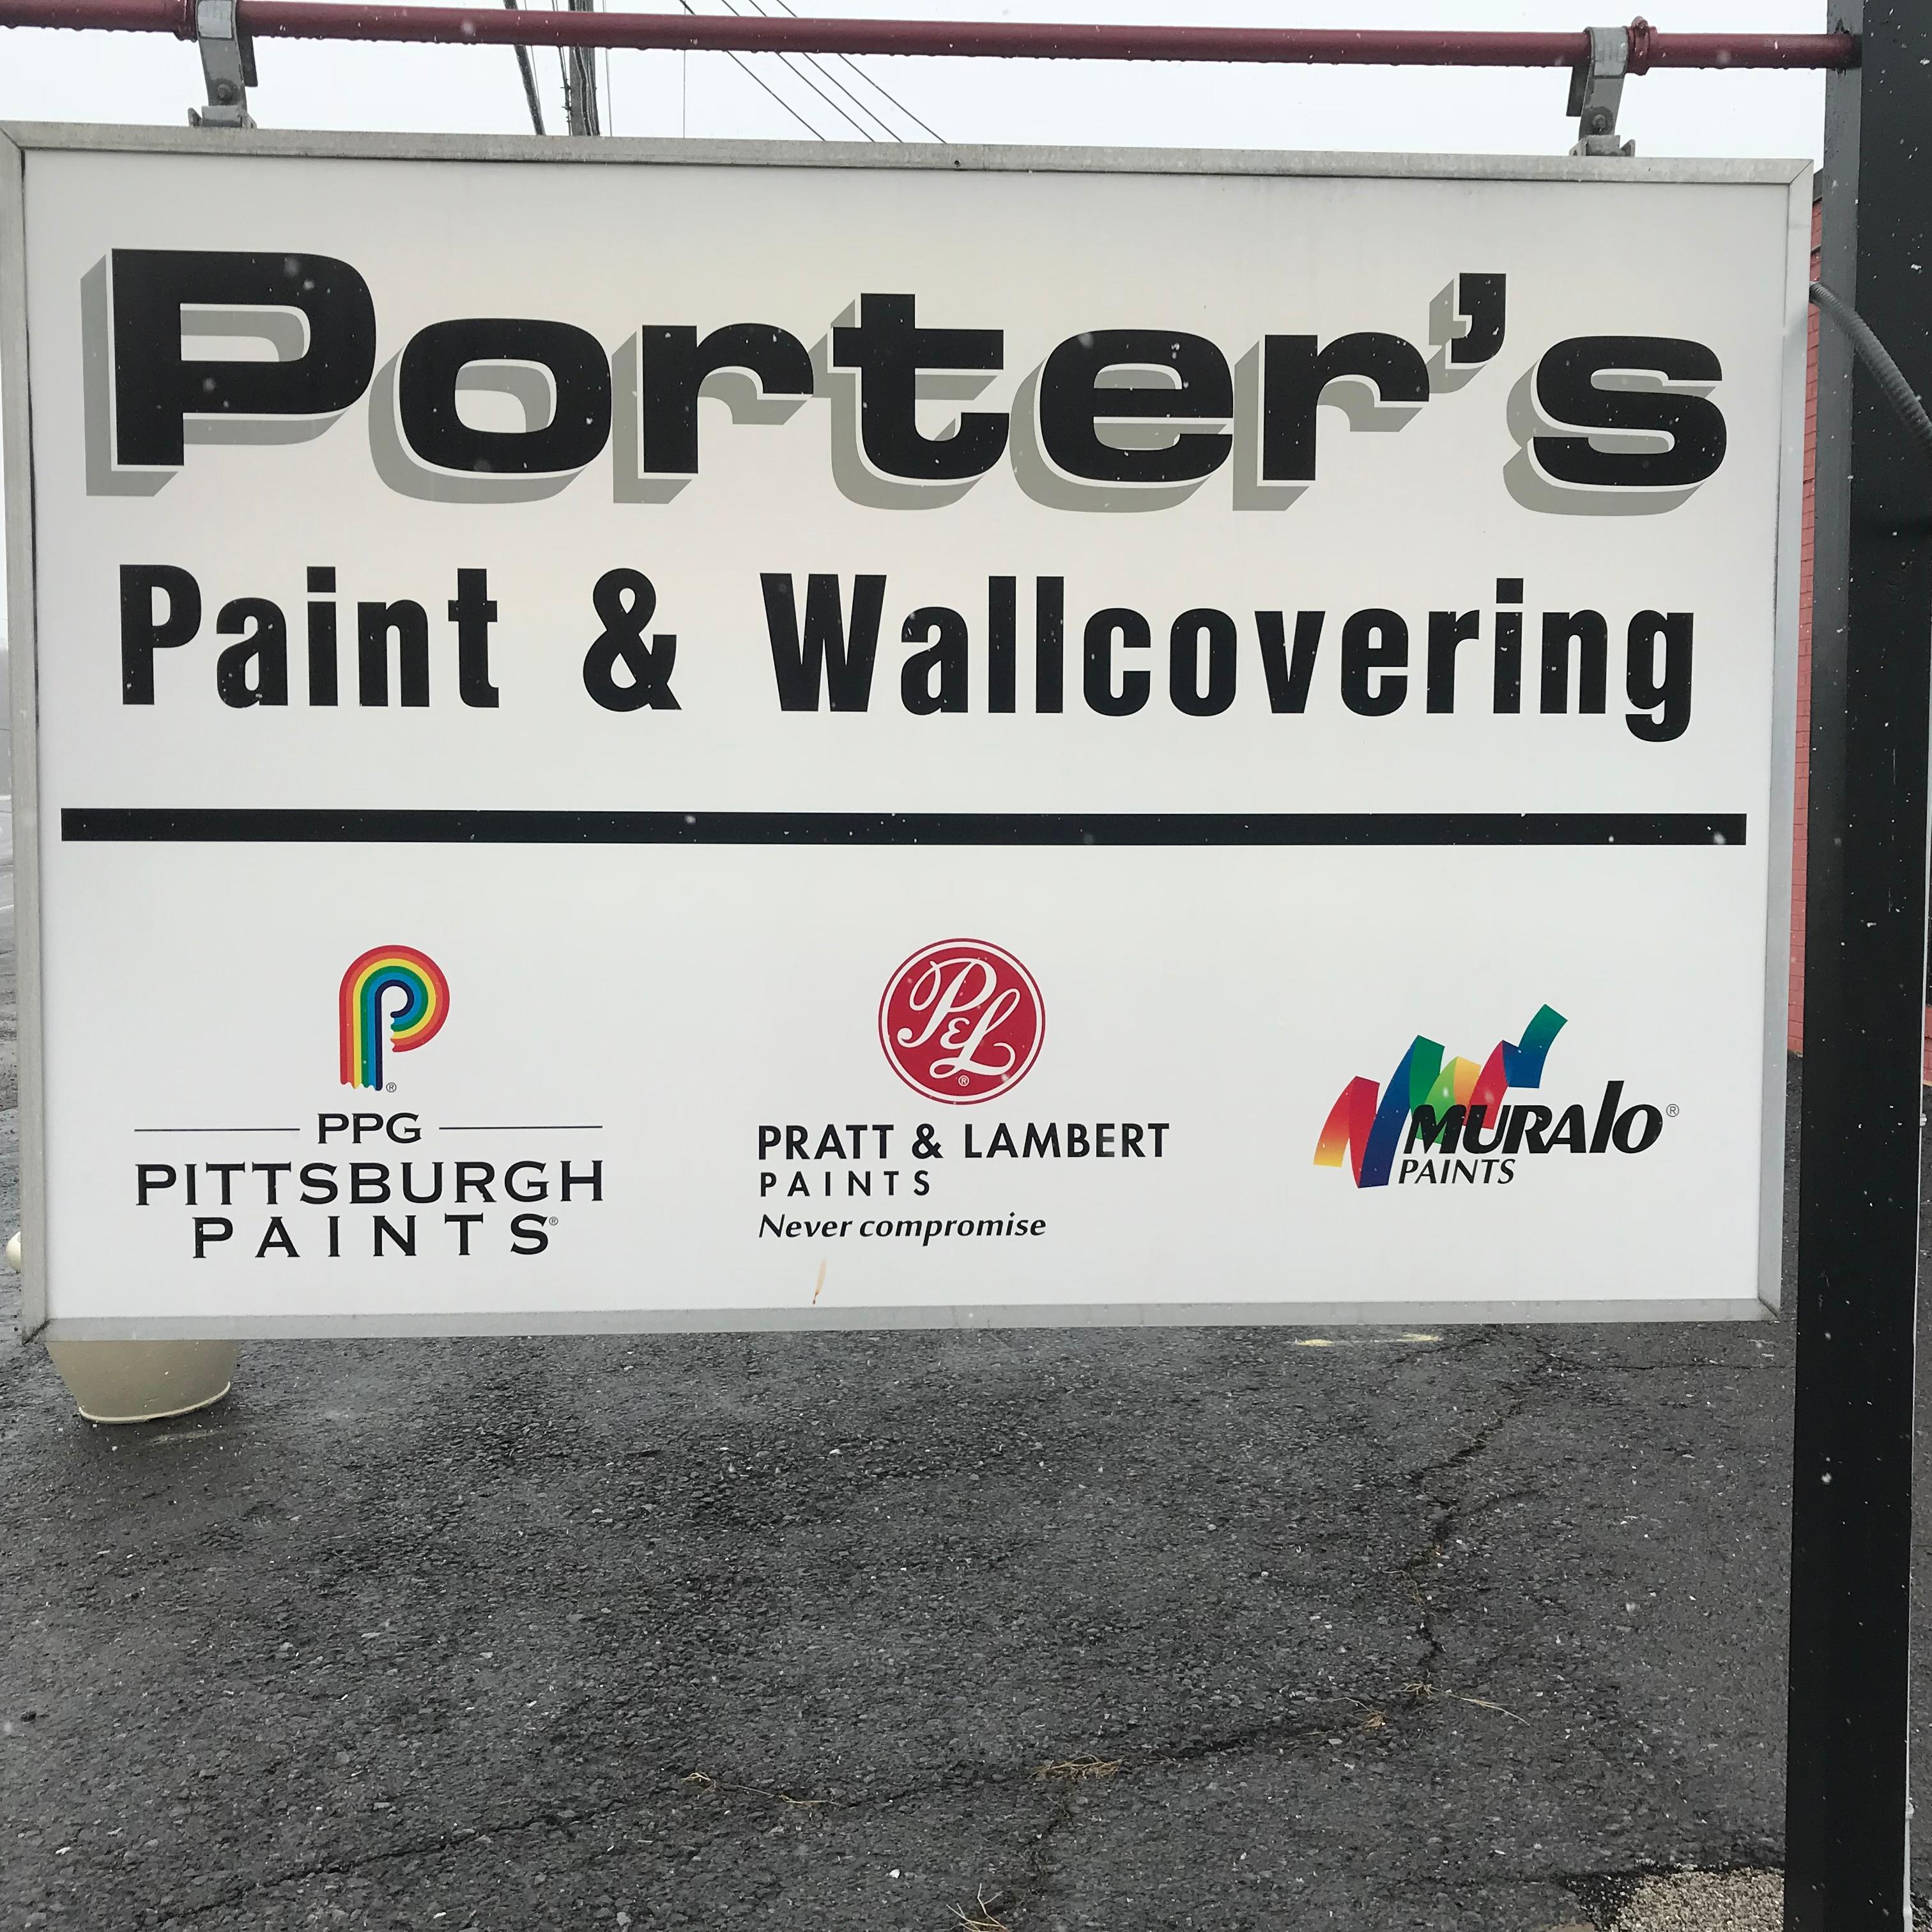 Porter's Paint & Wallcovering